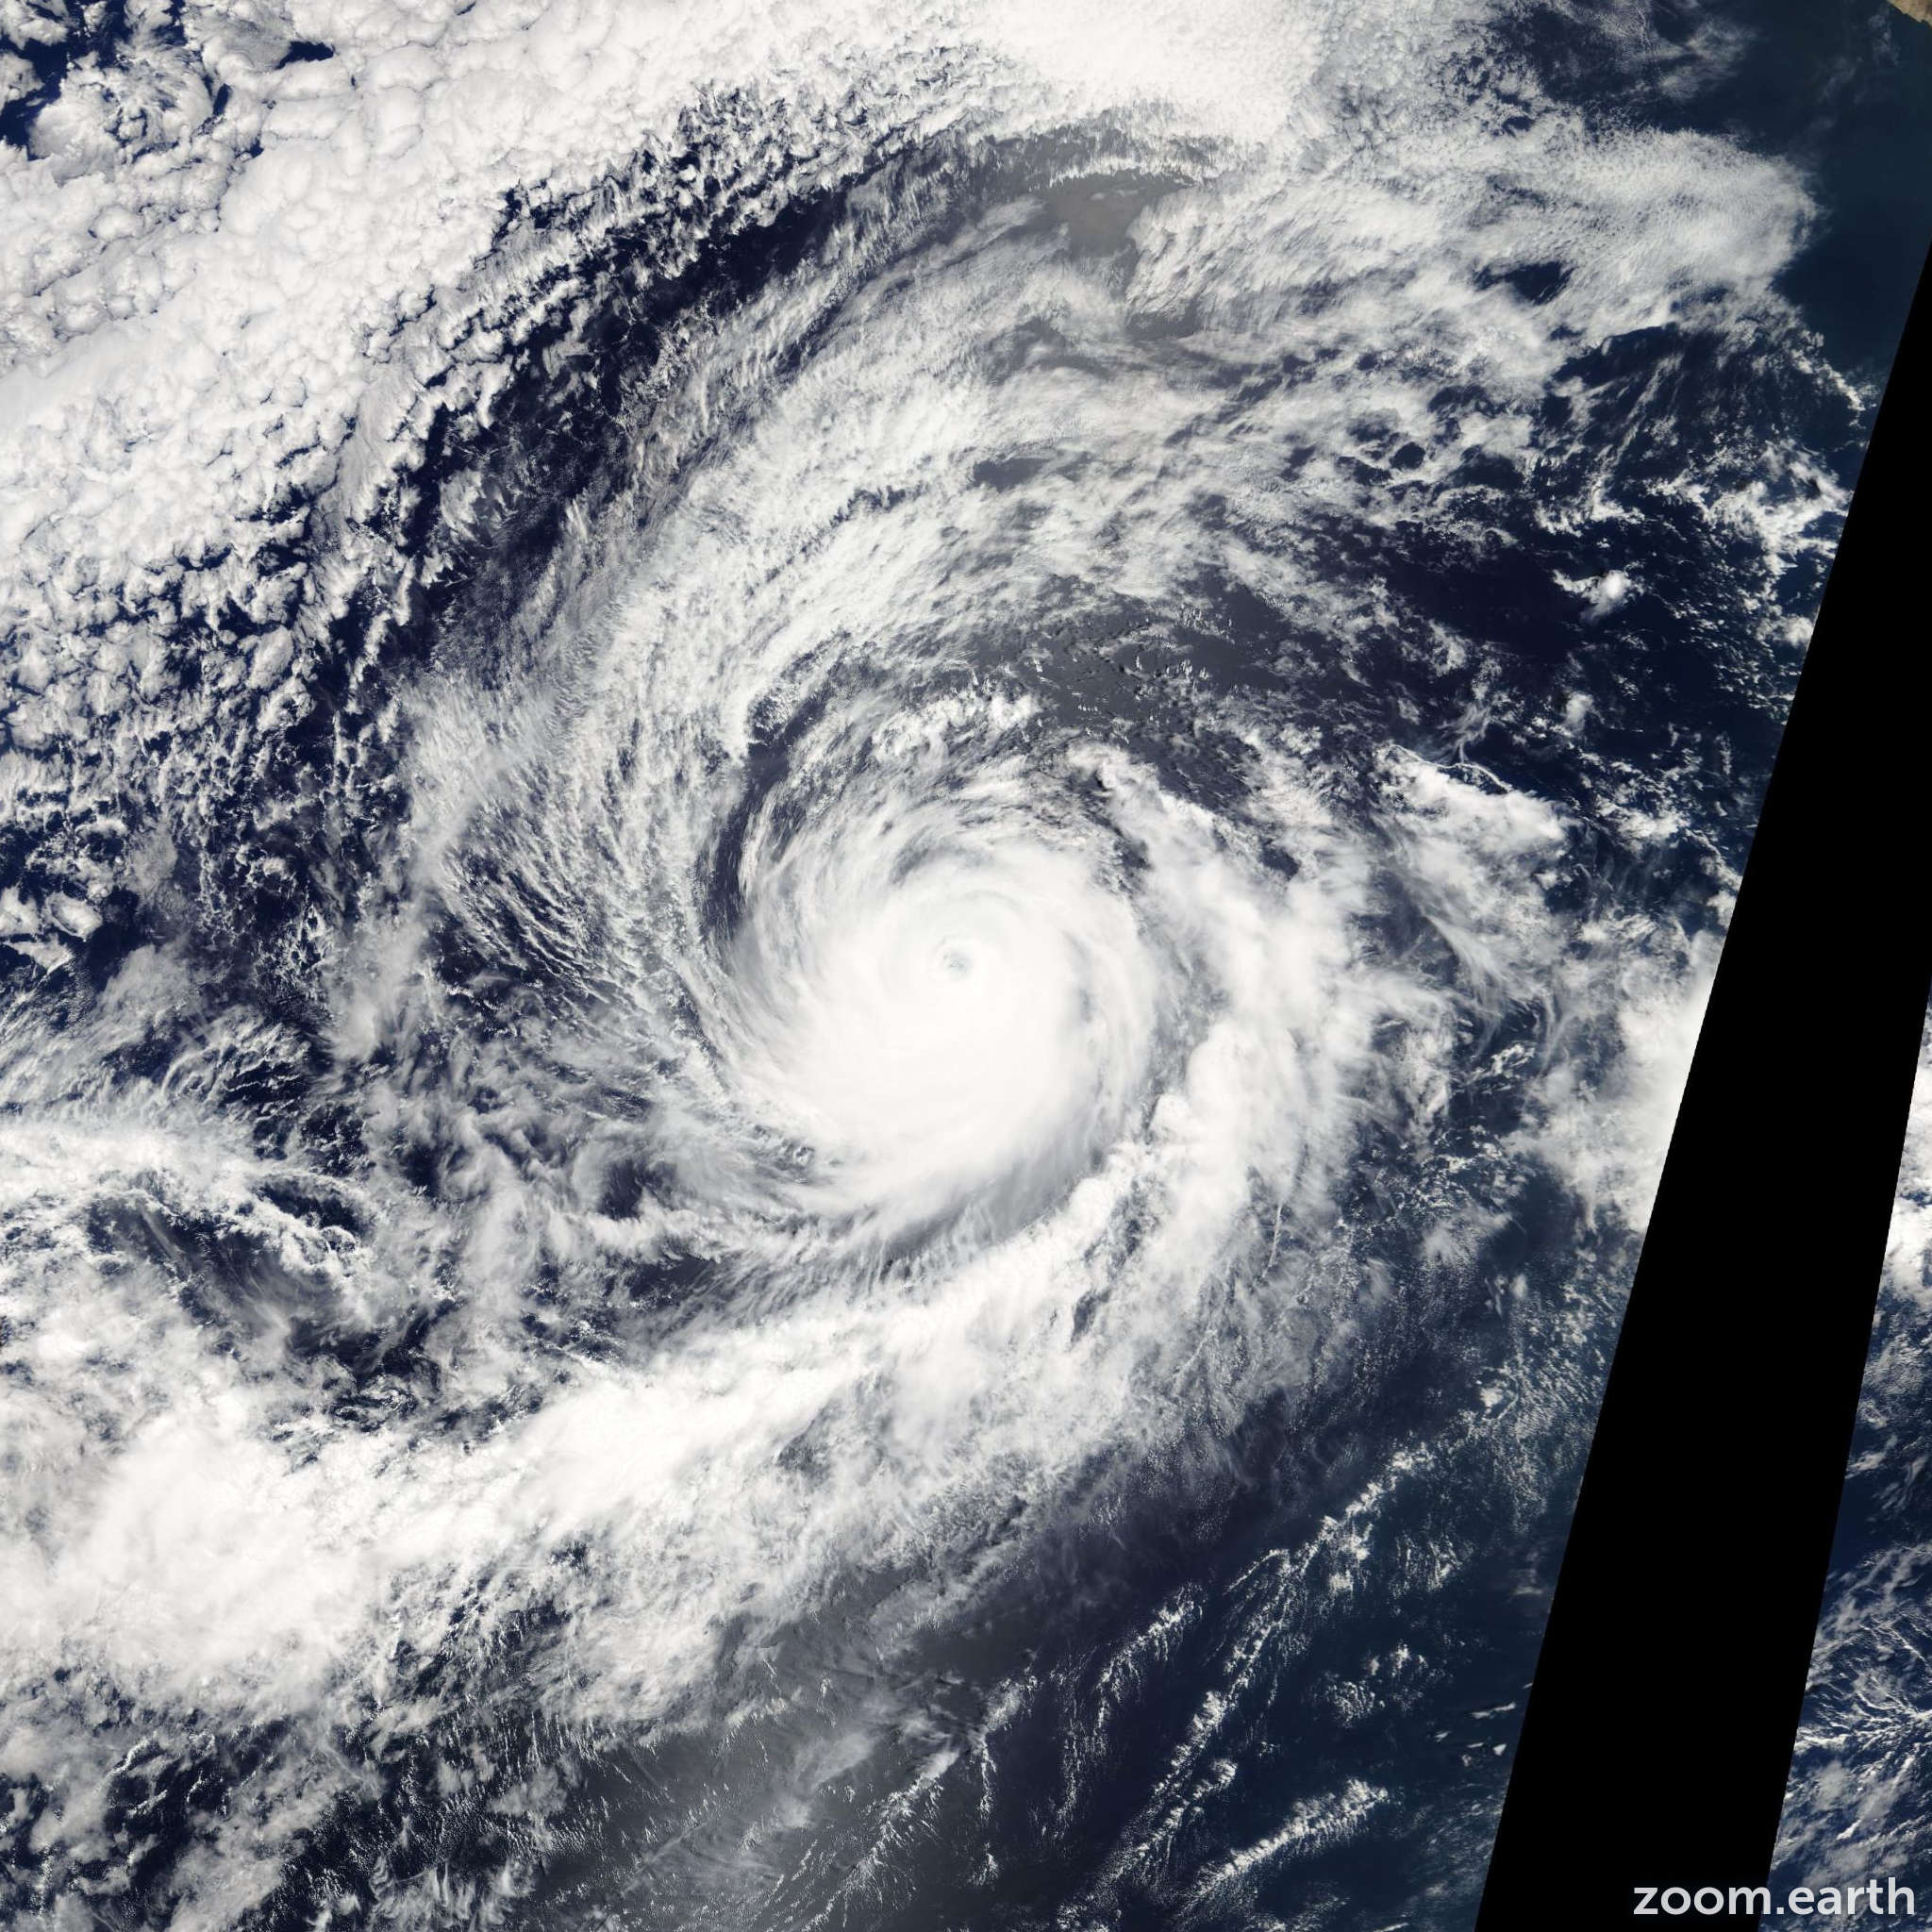 Satellite image of Hurricane Hernan 2008